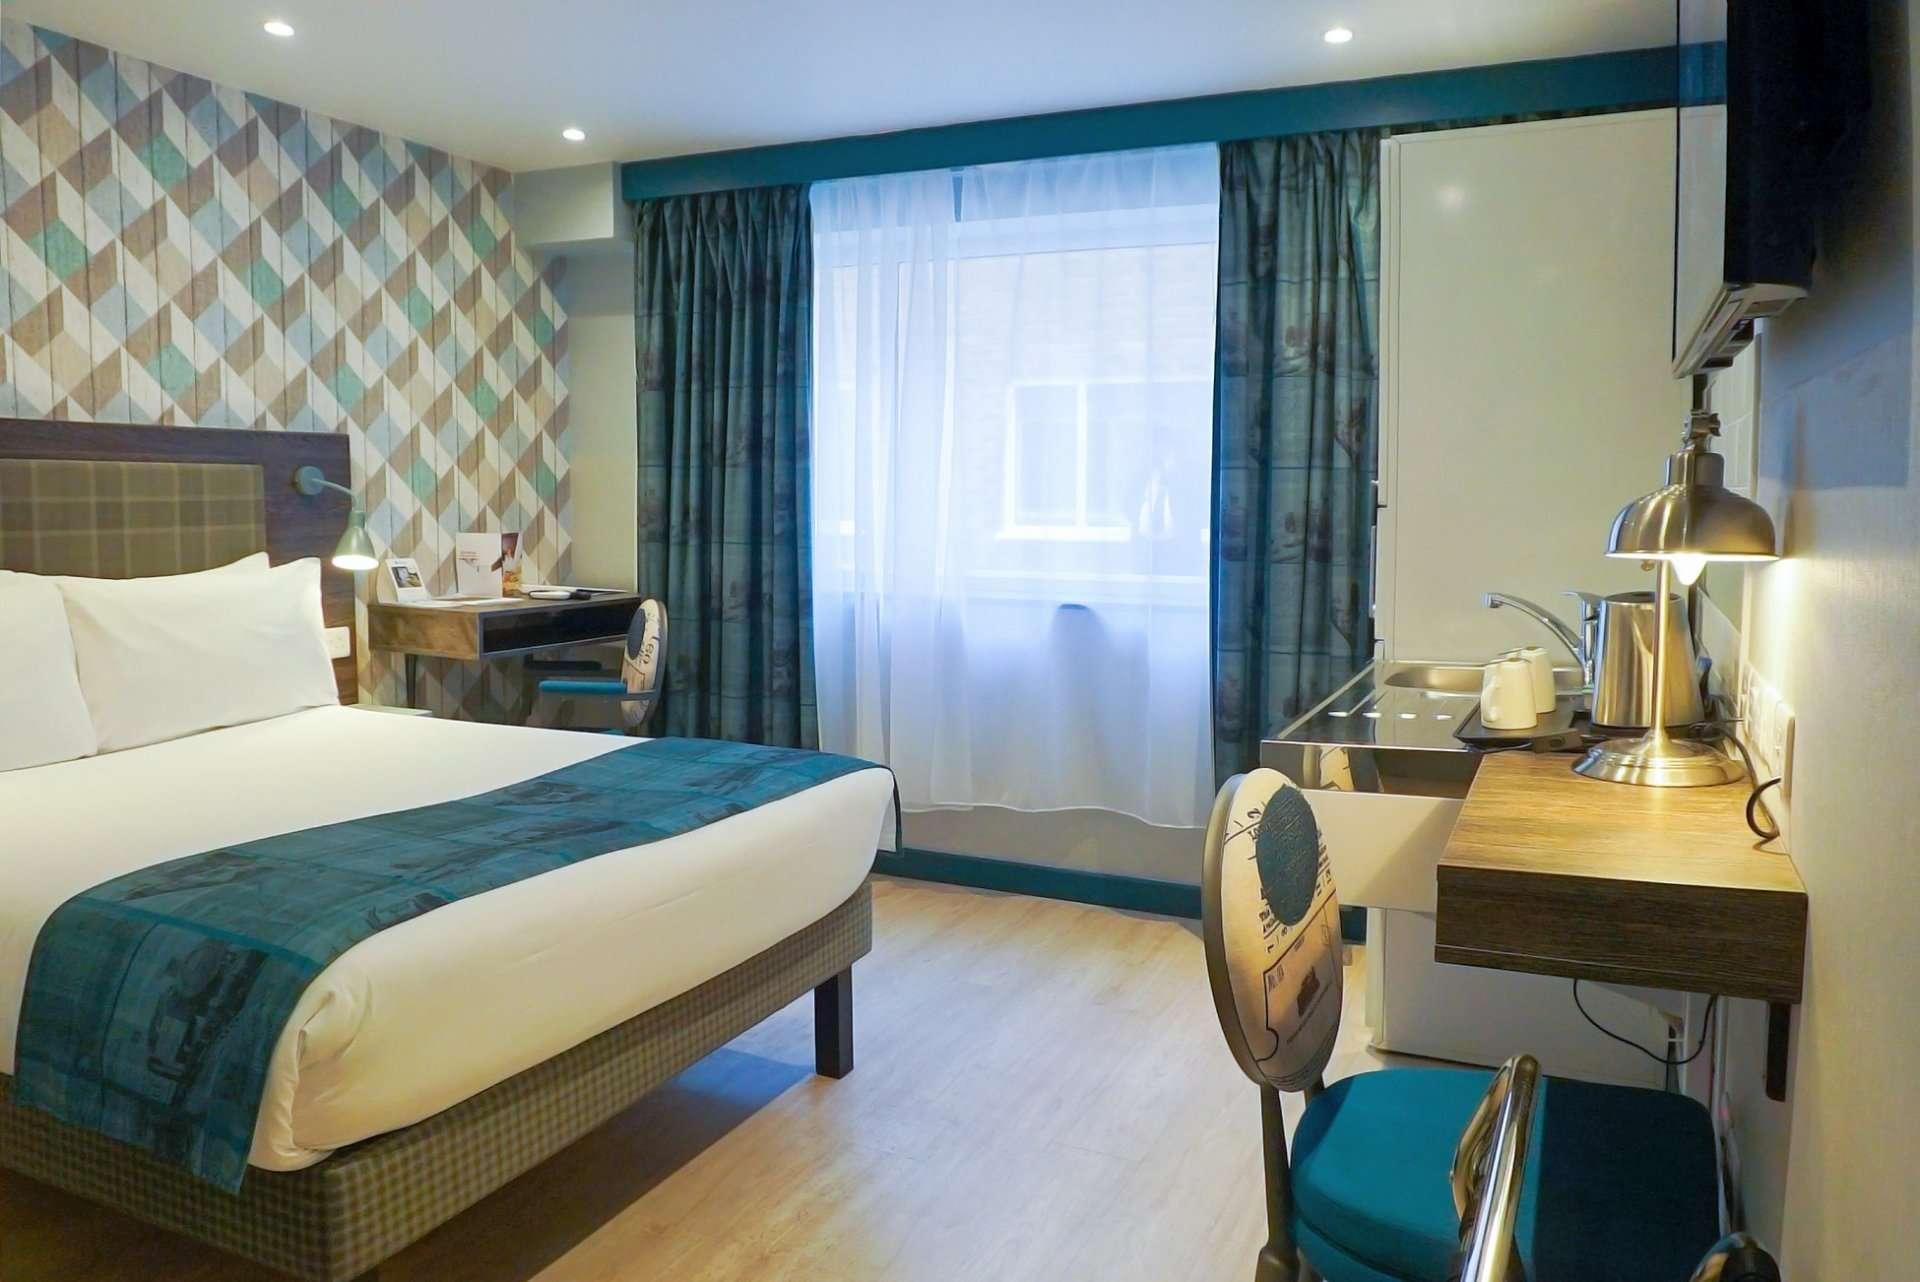 Double room at Best Western Plus Croydon